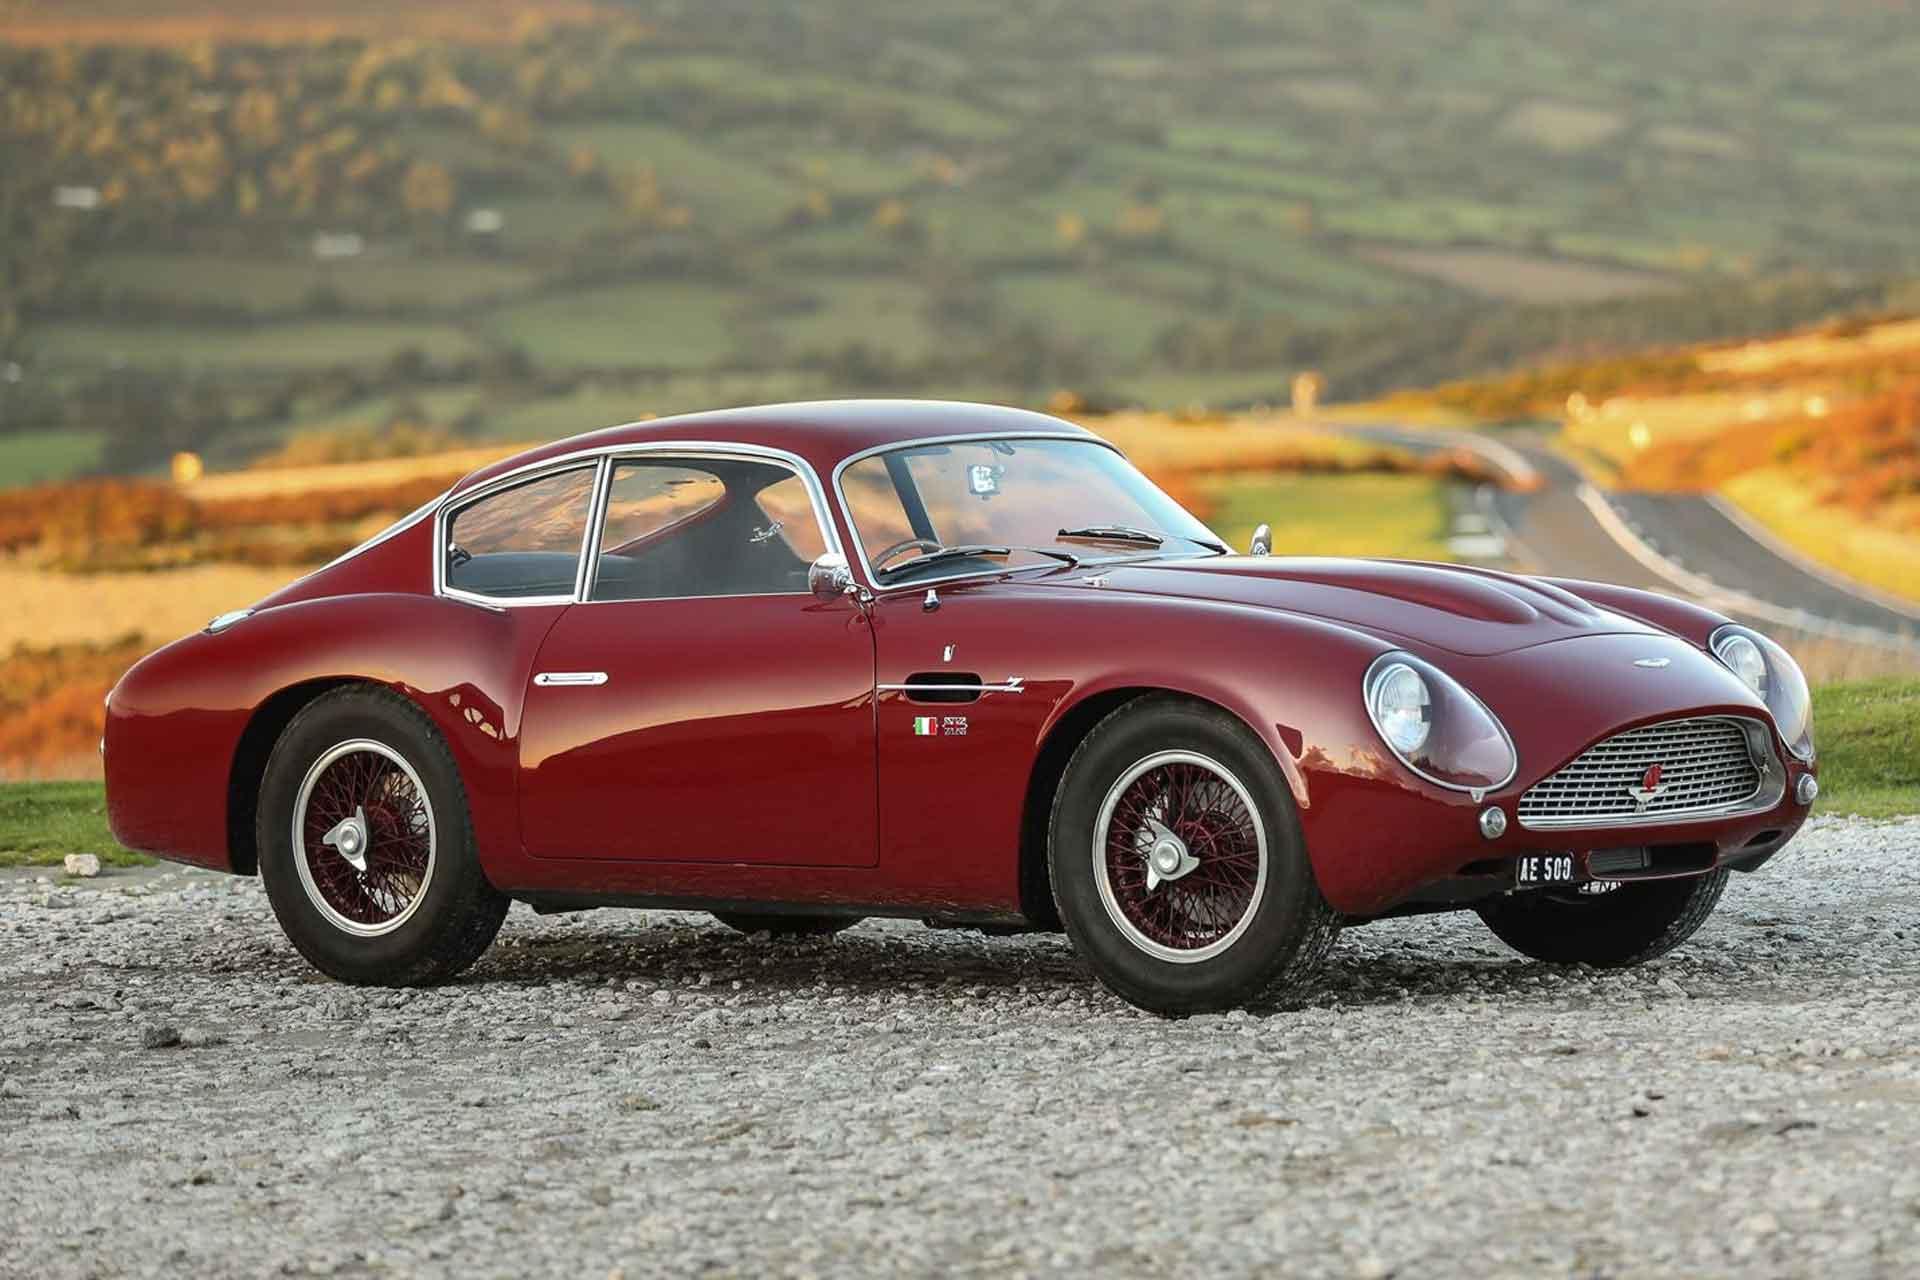 1961 Aston Martin Db4 Gt Zagato Coupé Uncrate